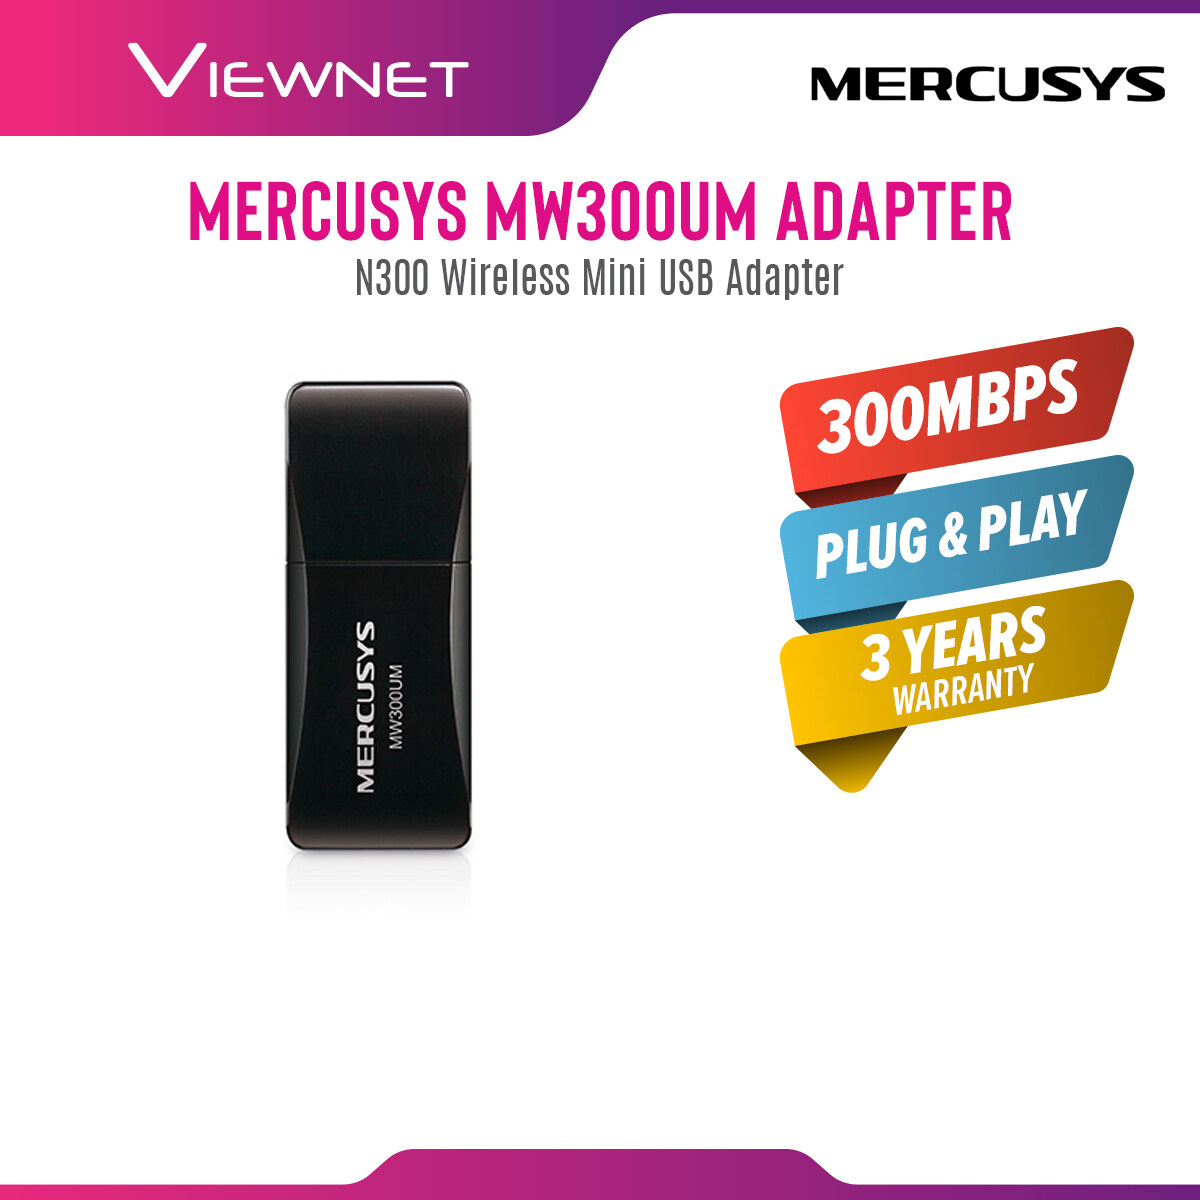 Mercusys MW300UM N300 300Mbps Mini USB Wireless WiFi Adapter w Hotspot (Powered by TP-Link)